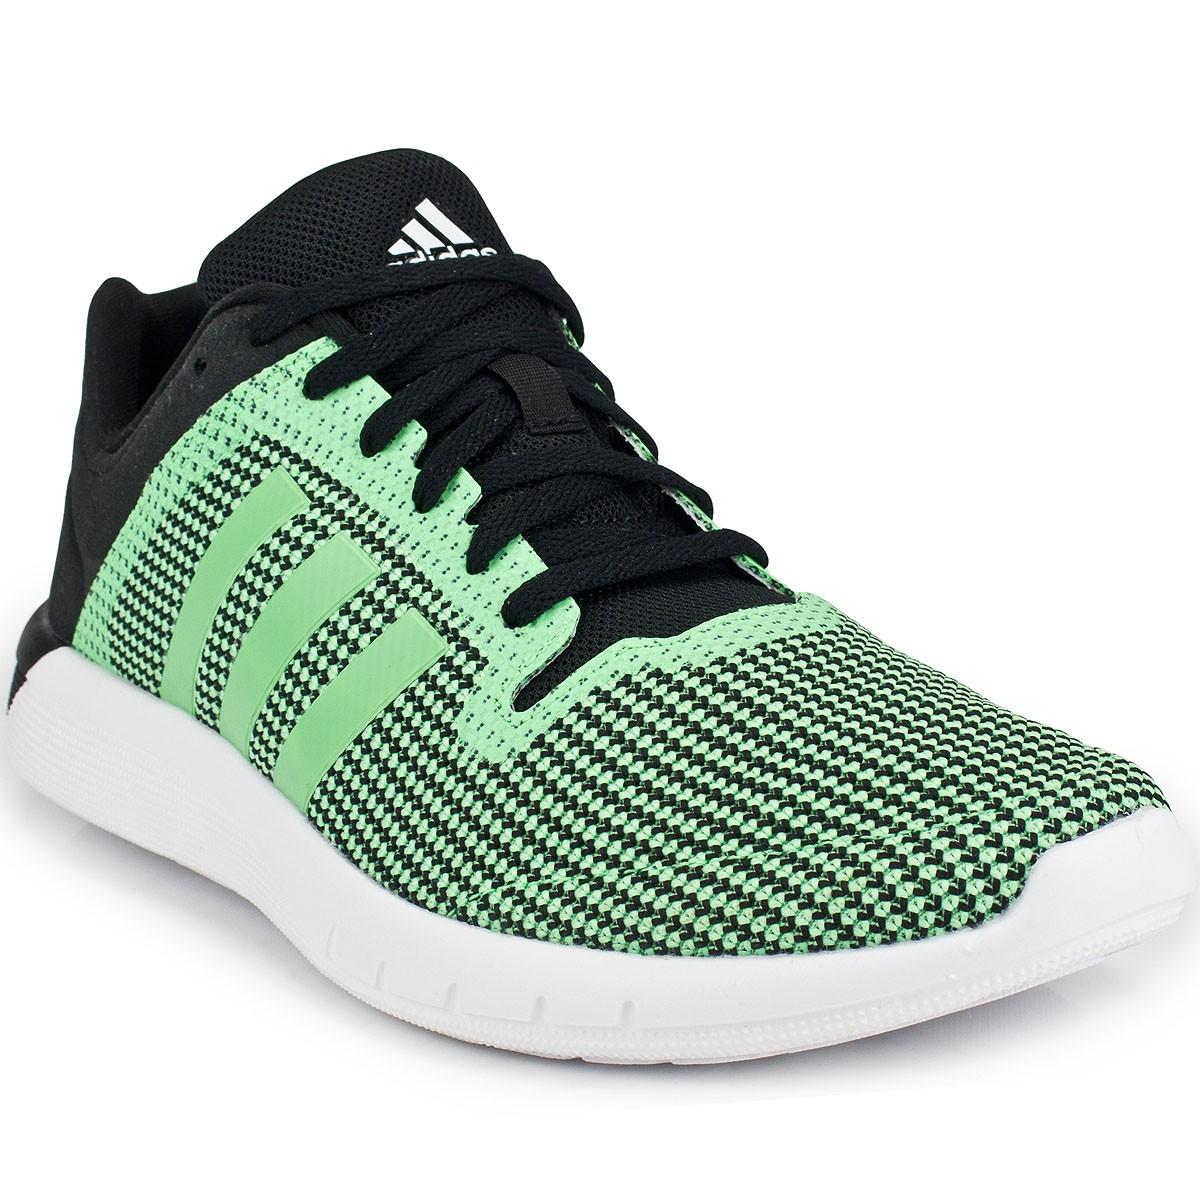 hot sale online 4839d b4b8d Tênis Adidas CC Fresh 2 M